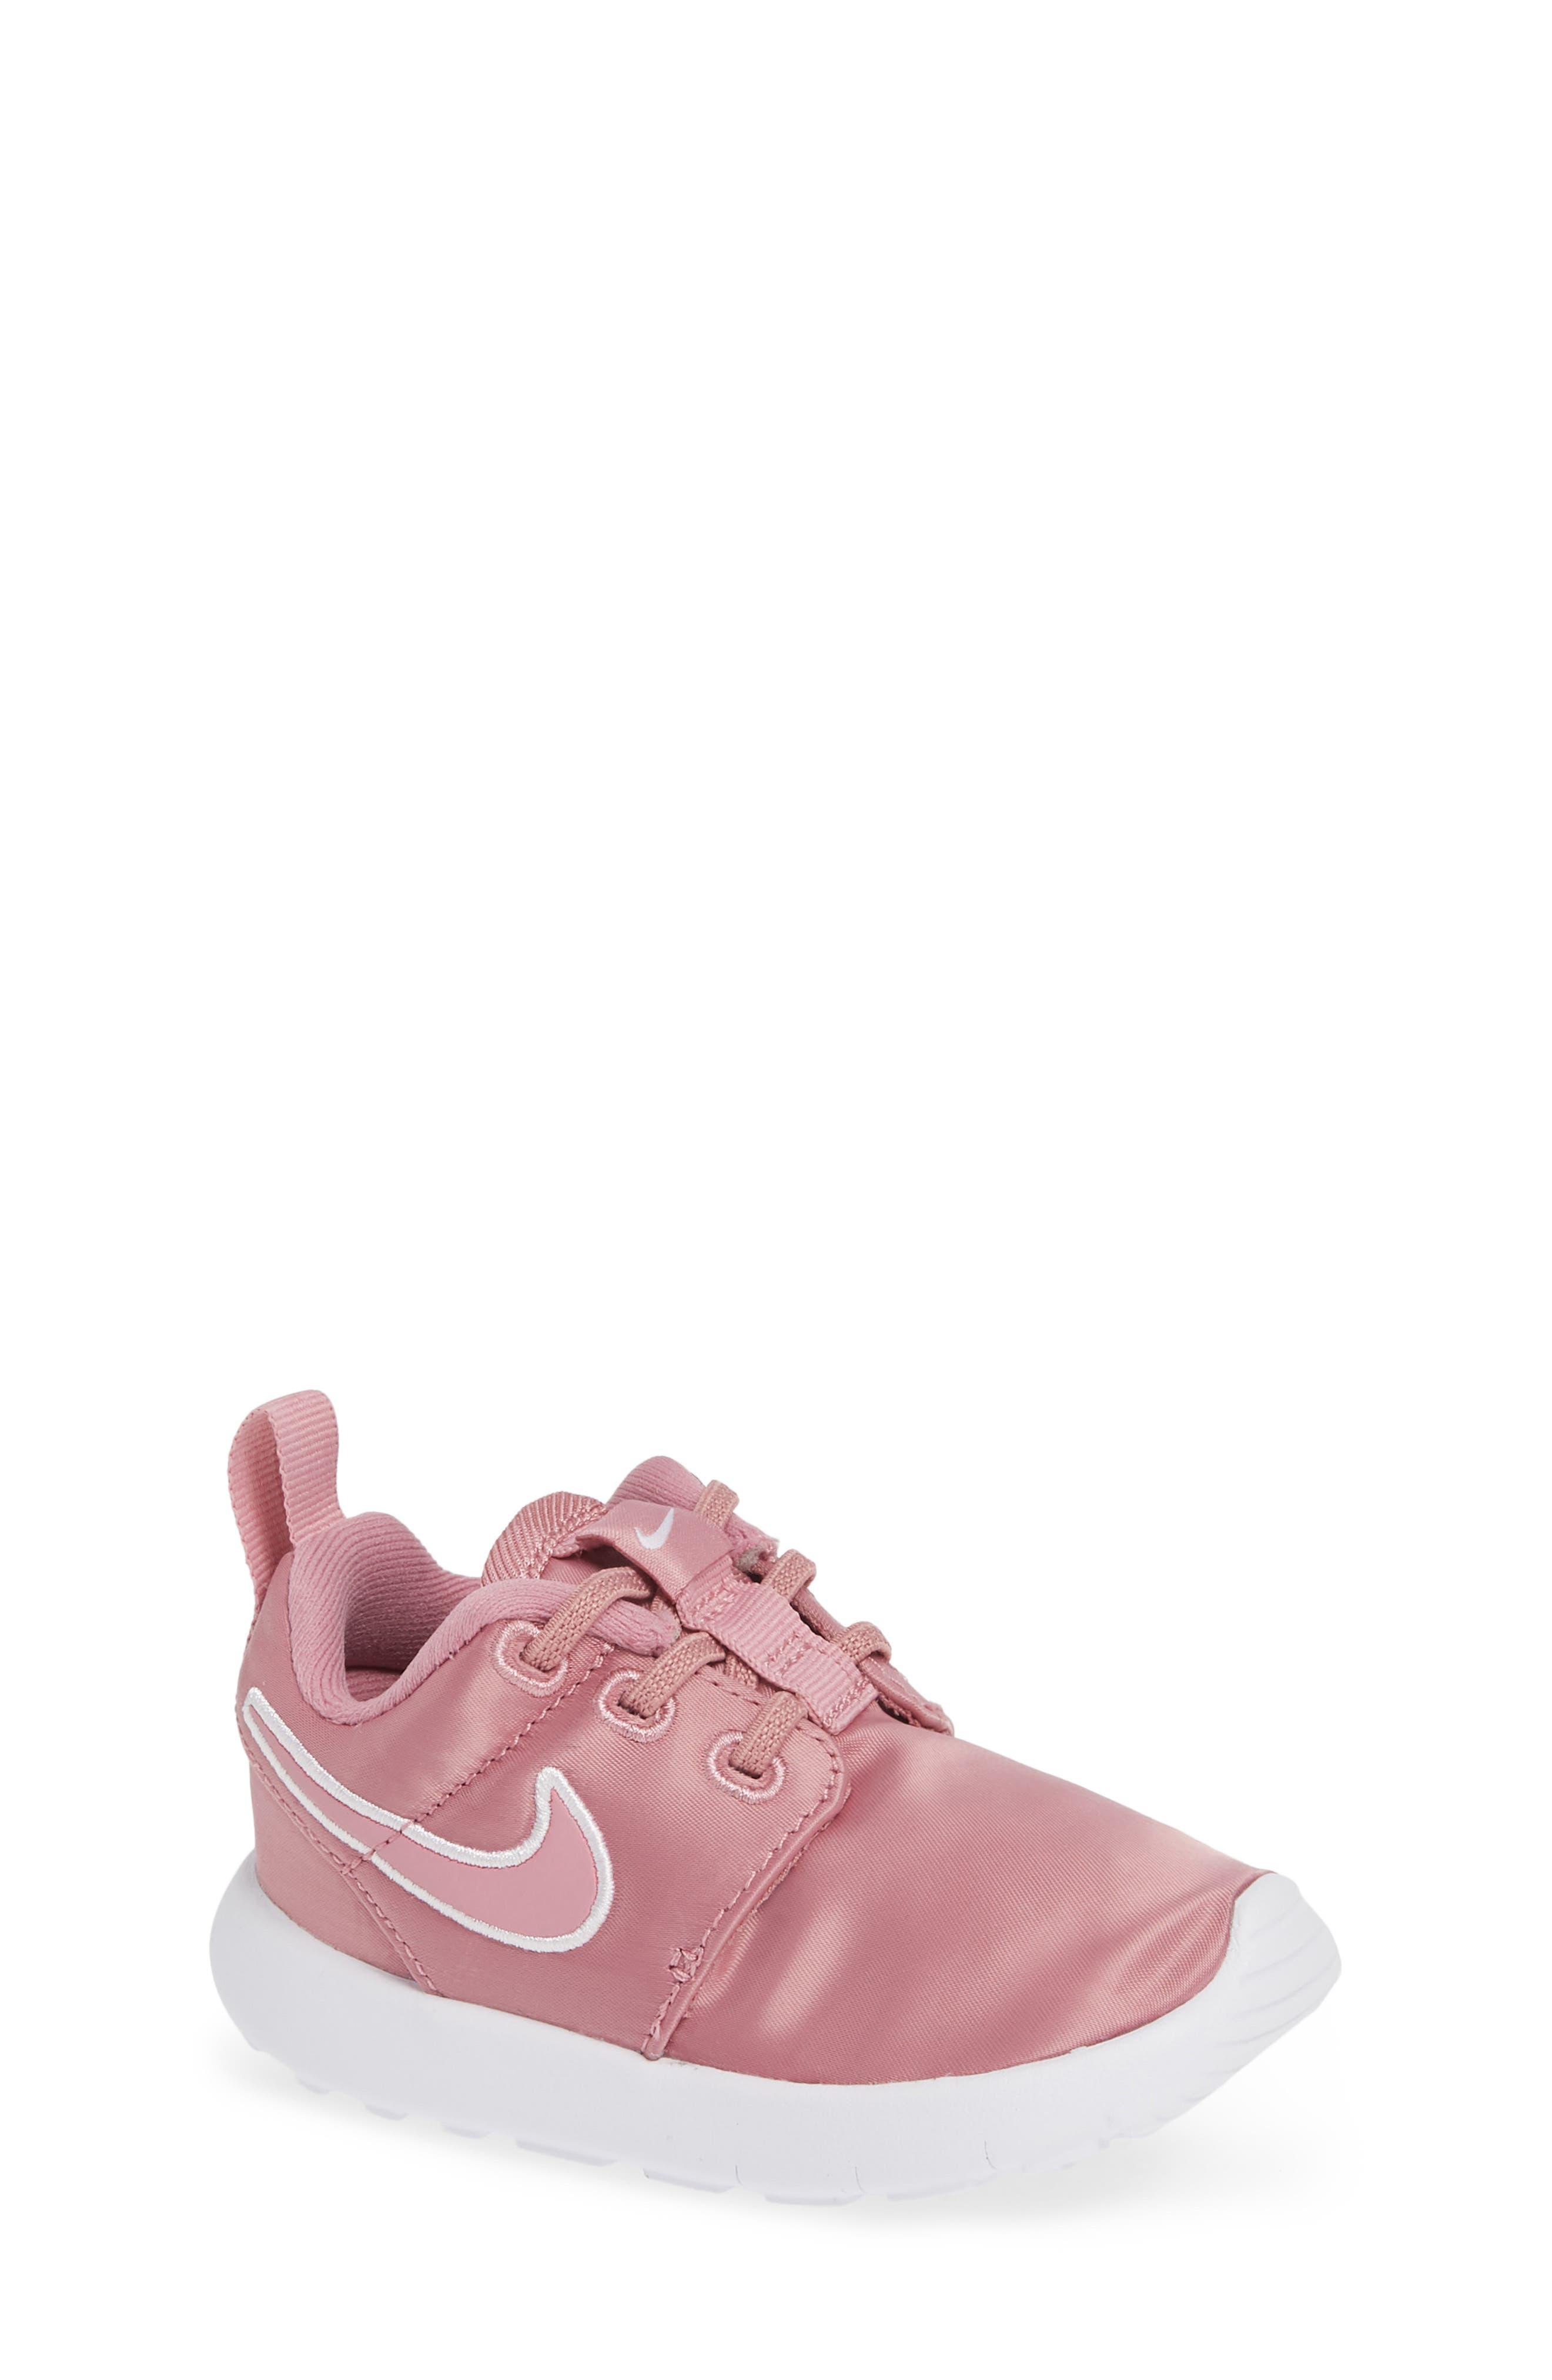 Roshe Run Sneaker,                         Main,                         color, ELEMENTAL PINK/ PINK-WHITE